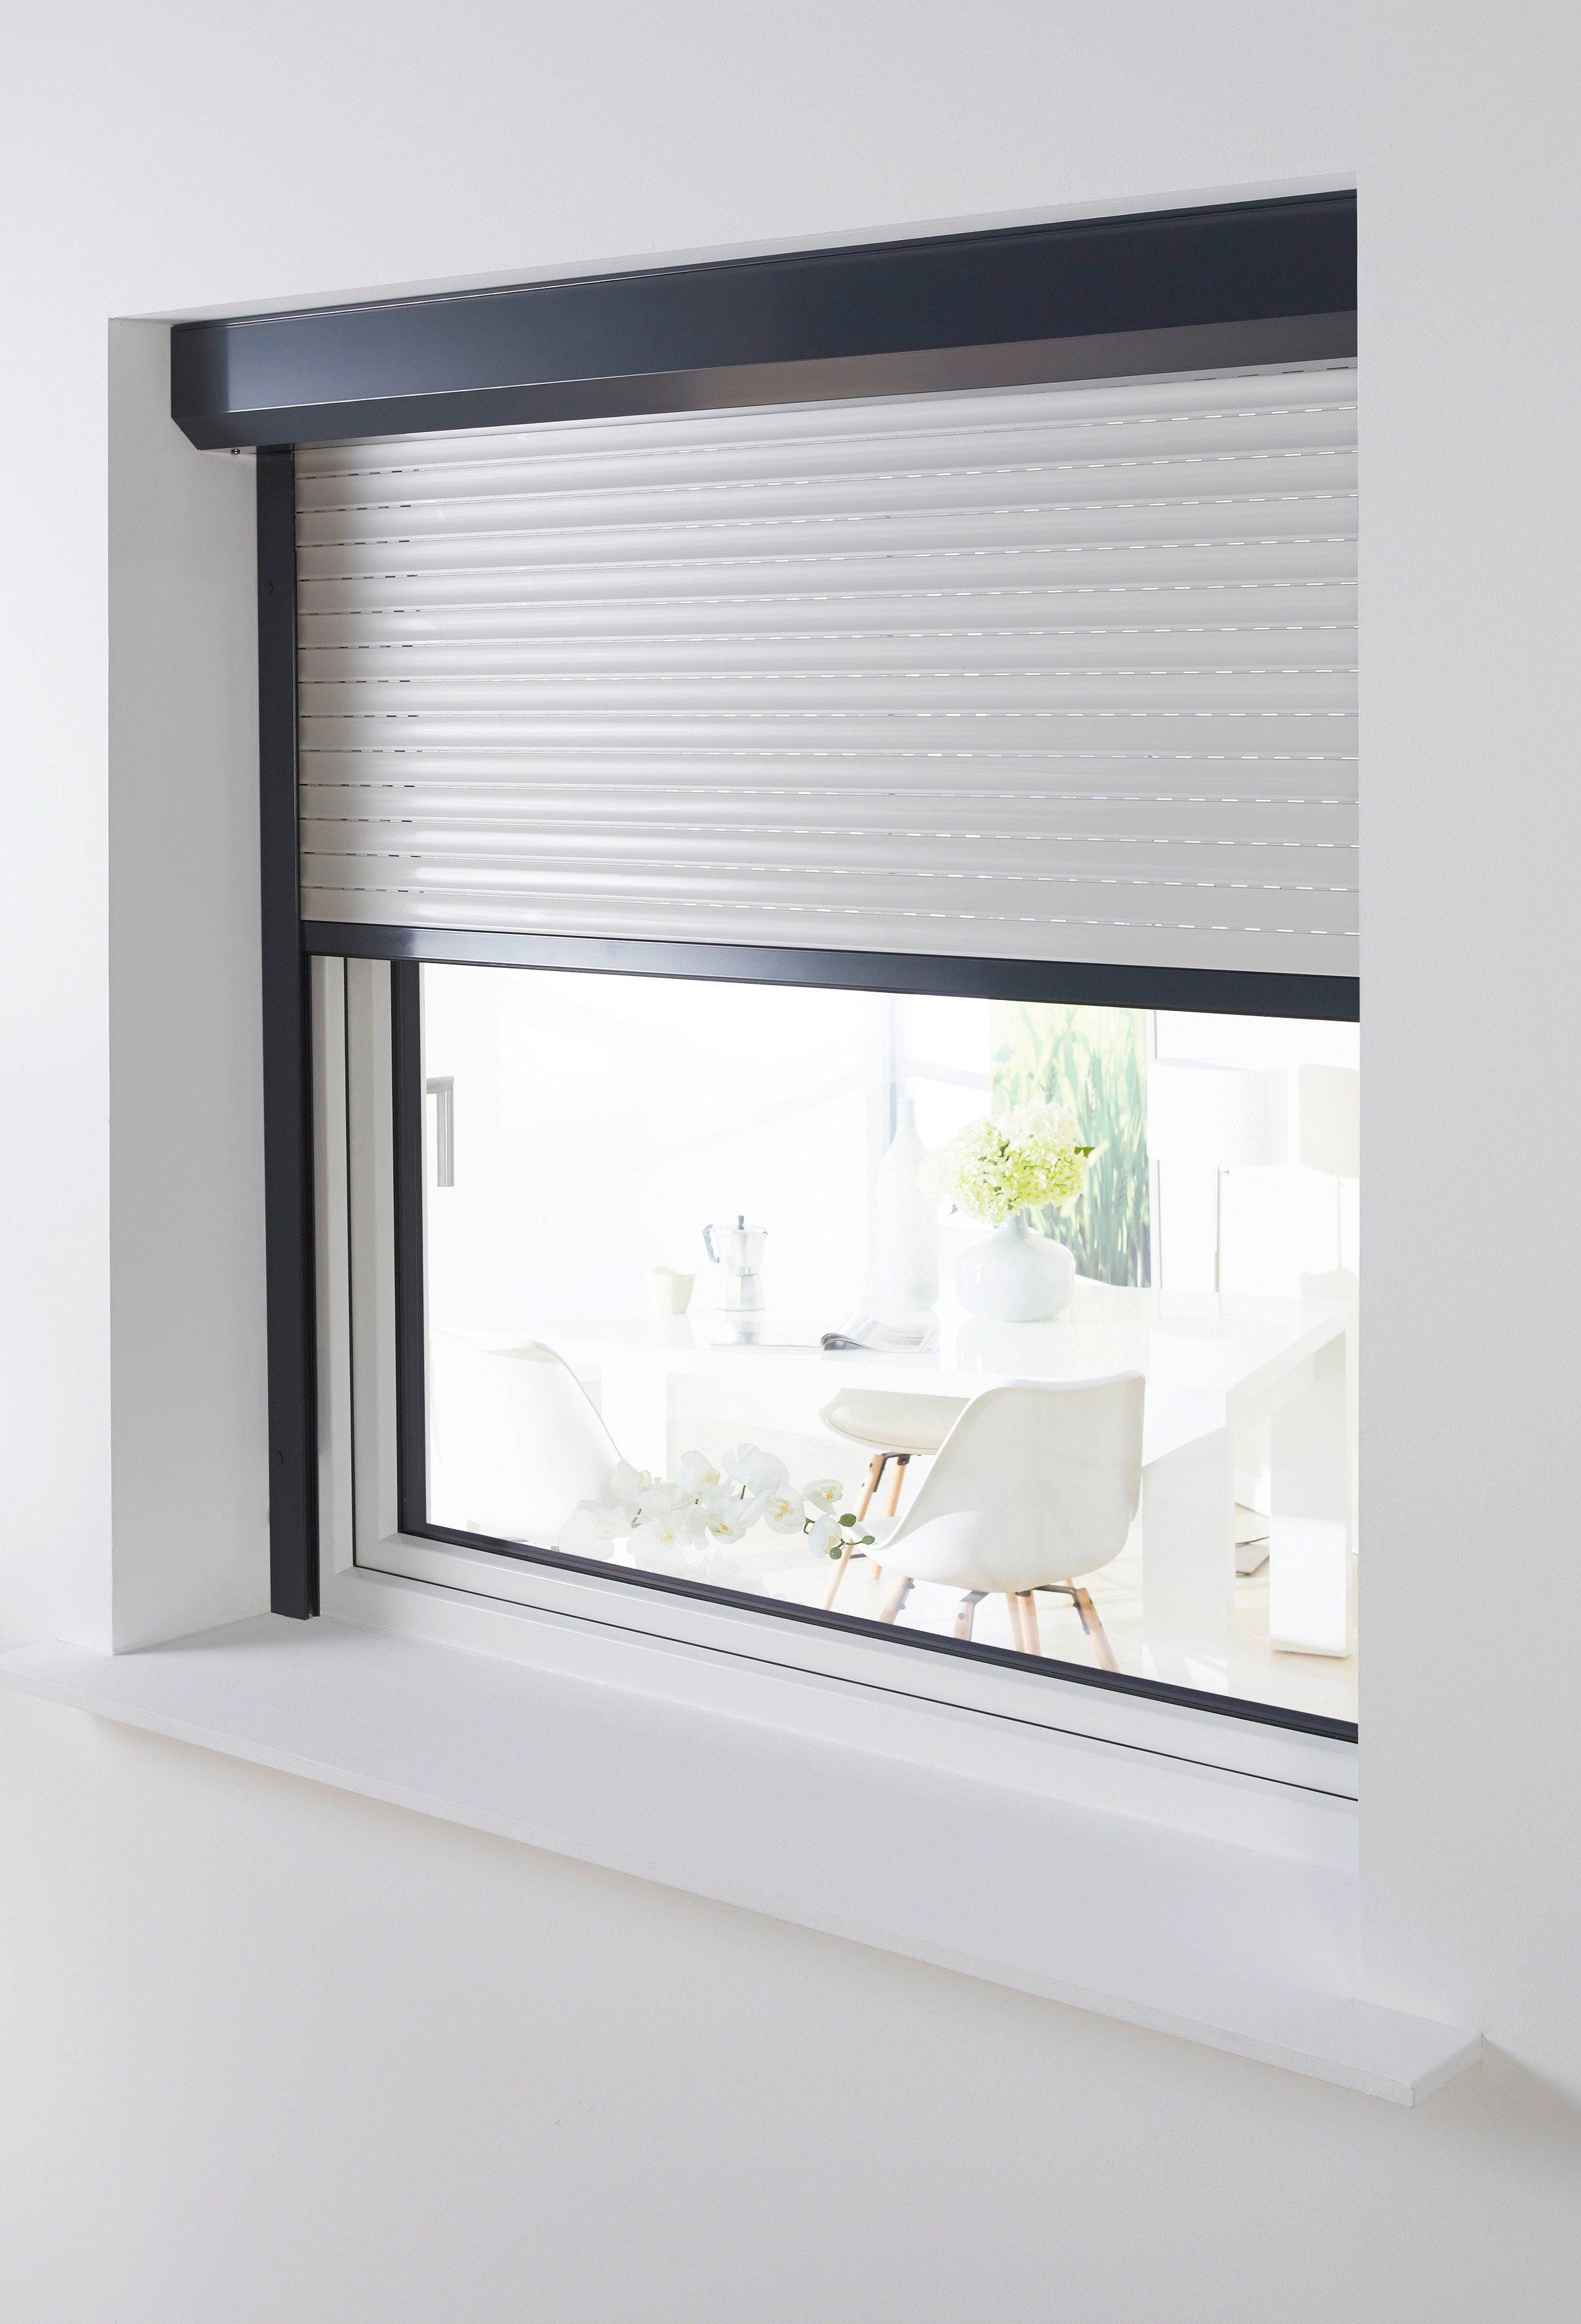 Aluminium »Vorbau-Rollladen« Sondermaß Breite, Höhe: 130 cm, anthrazit-grau